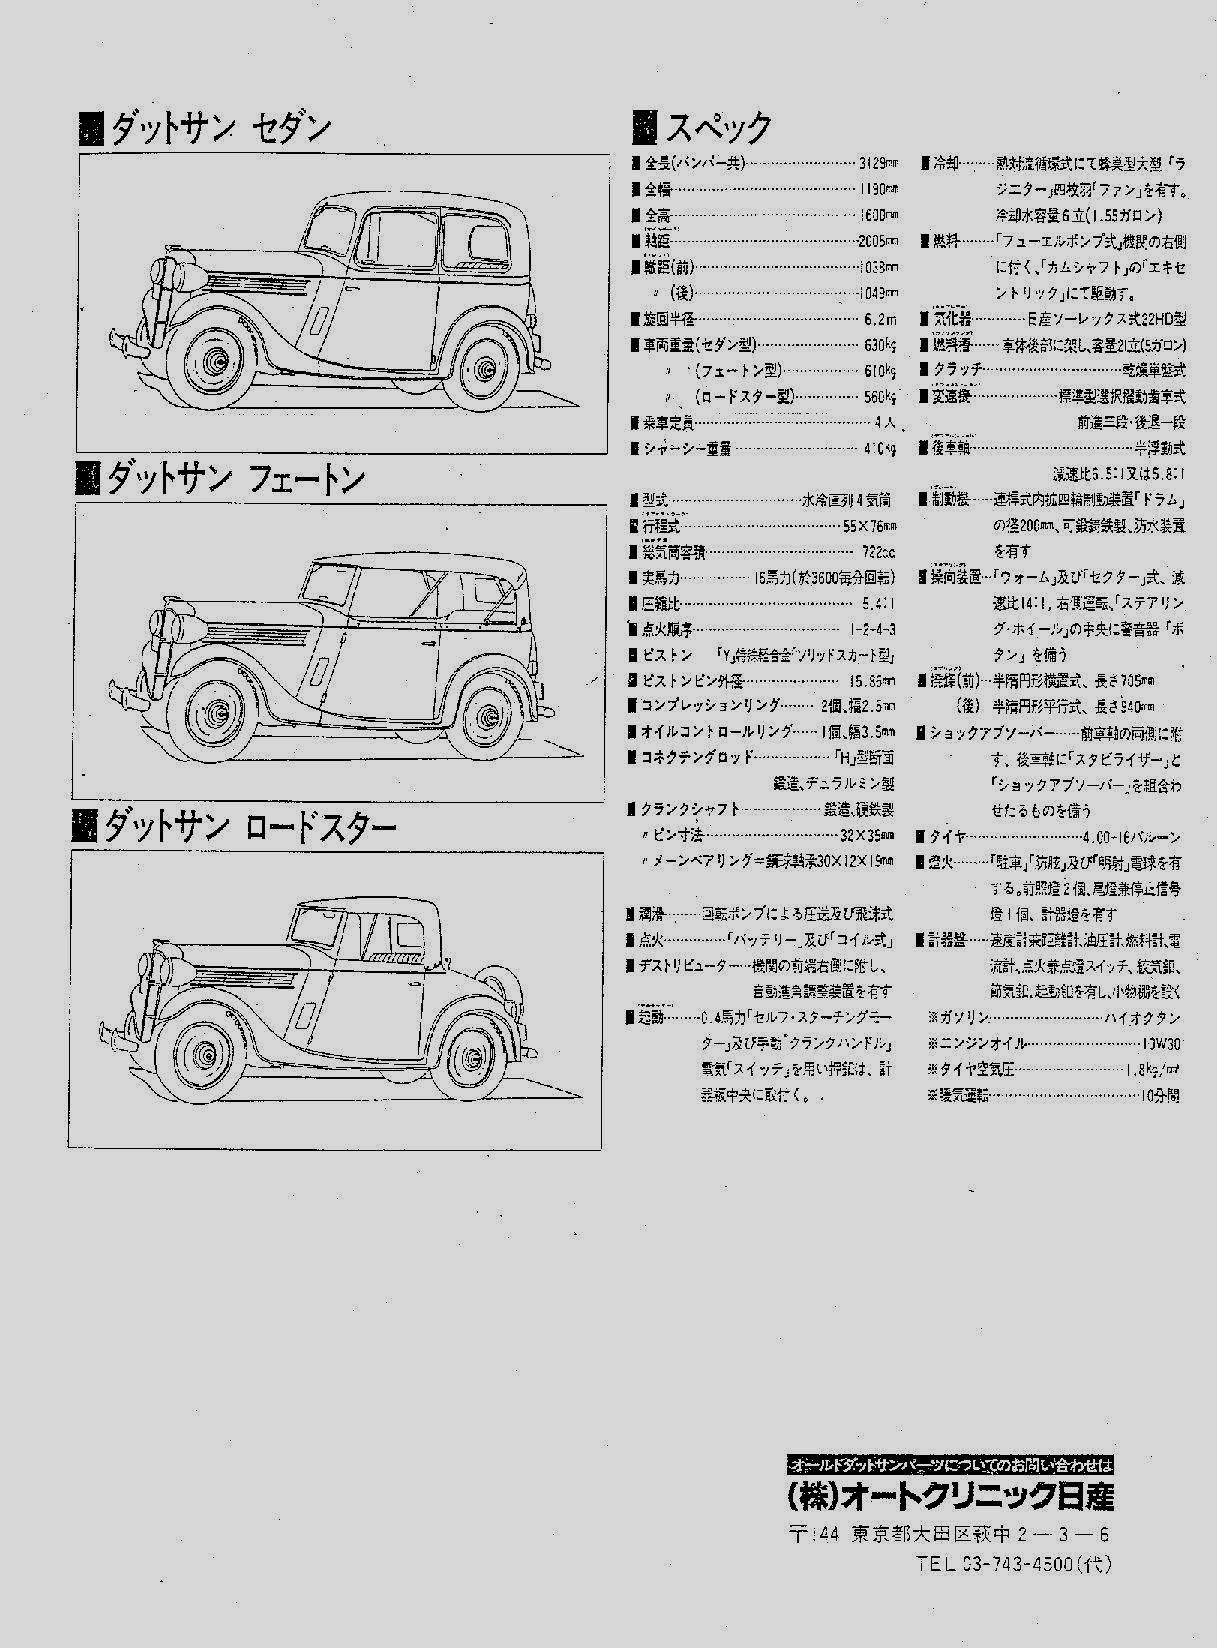 nissan 280zx parts catalog